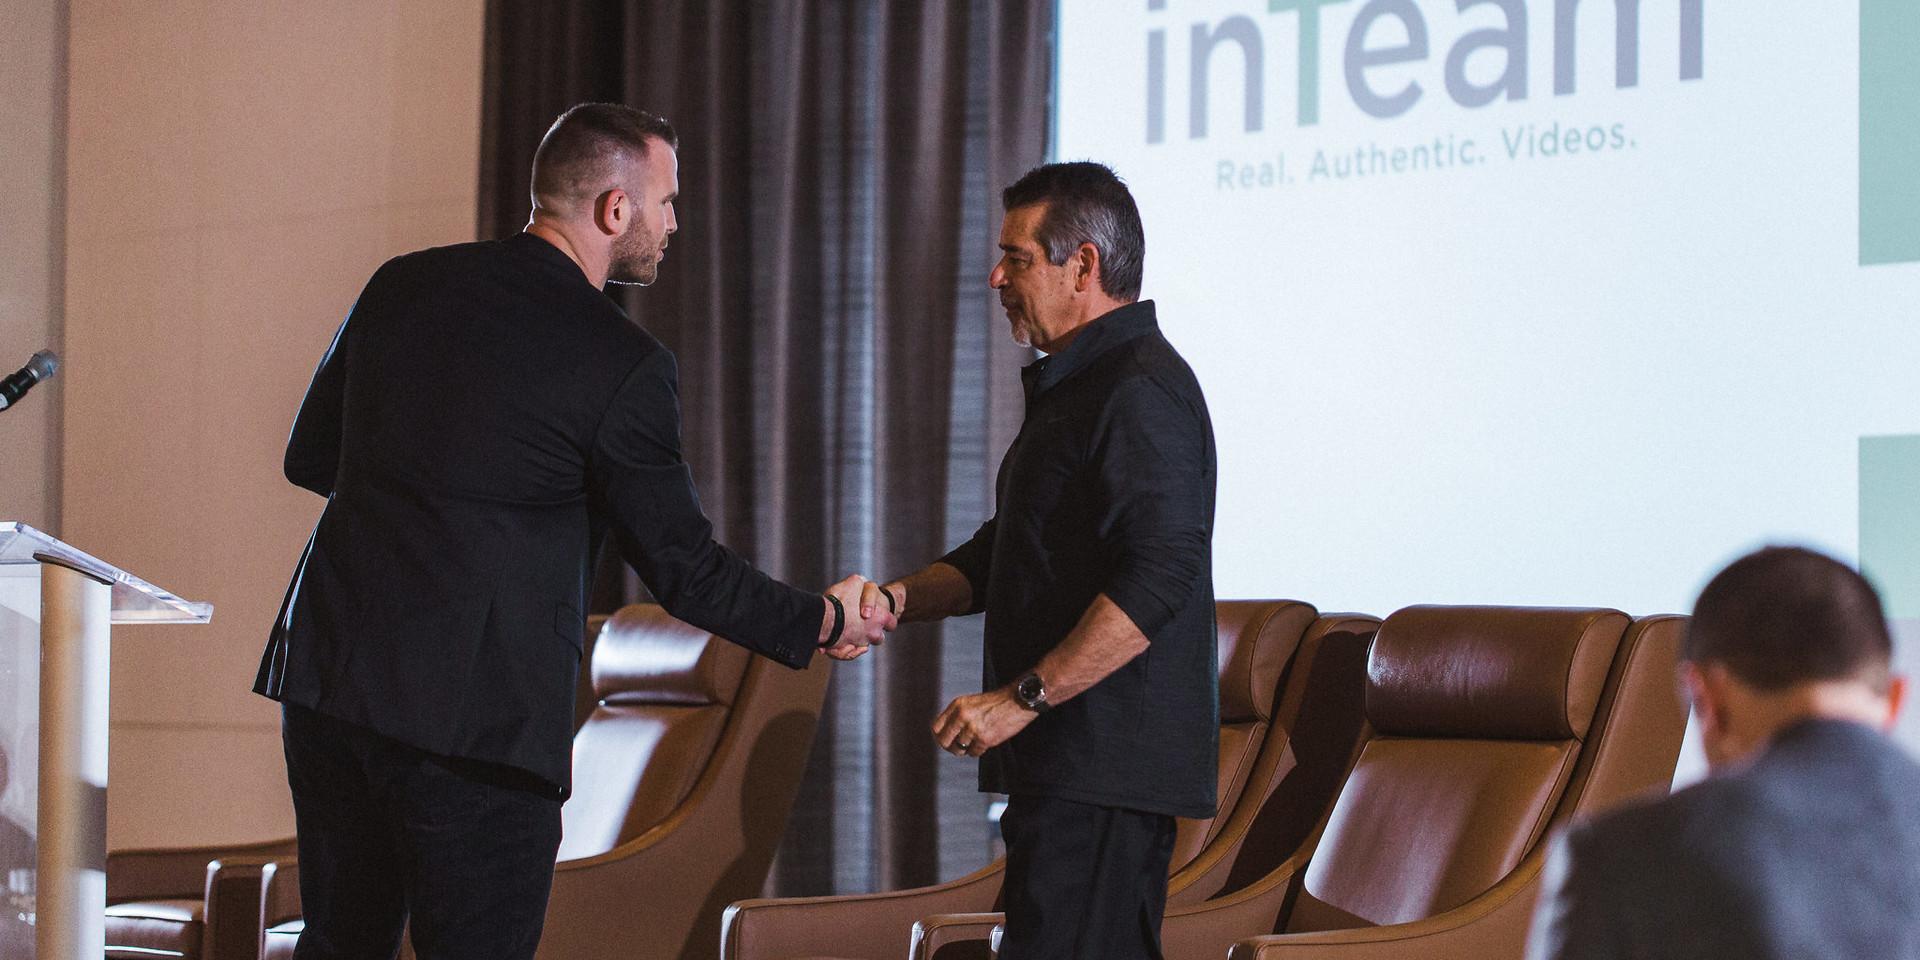 Tim Kight - inTeam 2018 Inspiration Award Ceremony